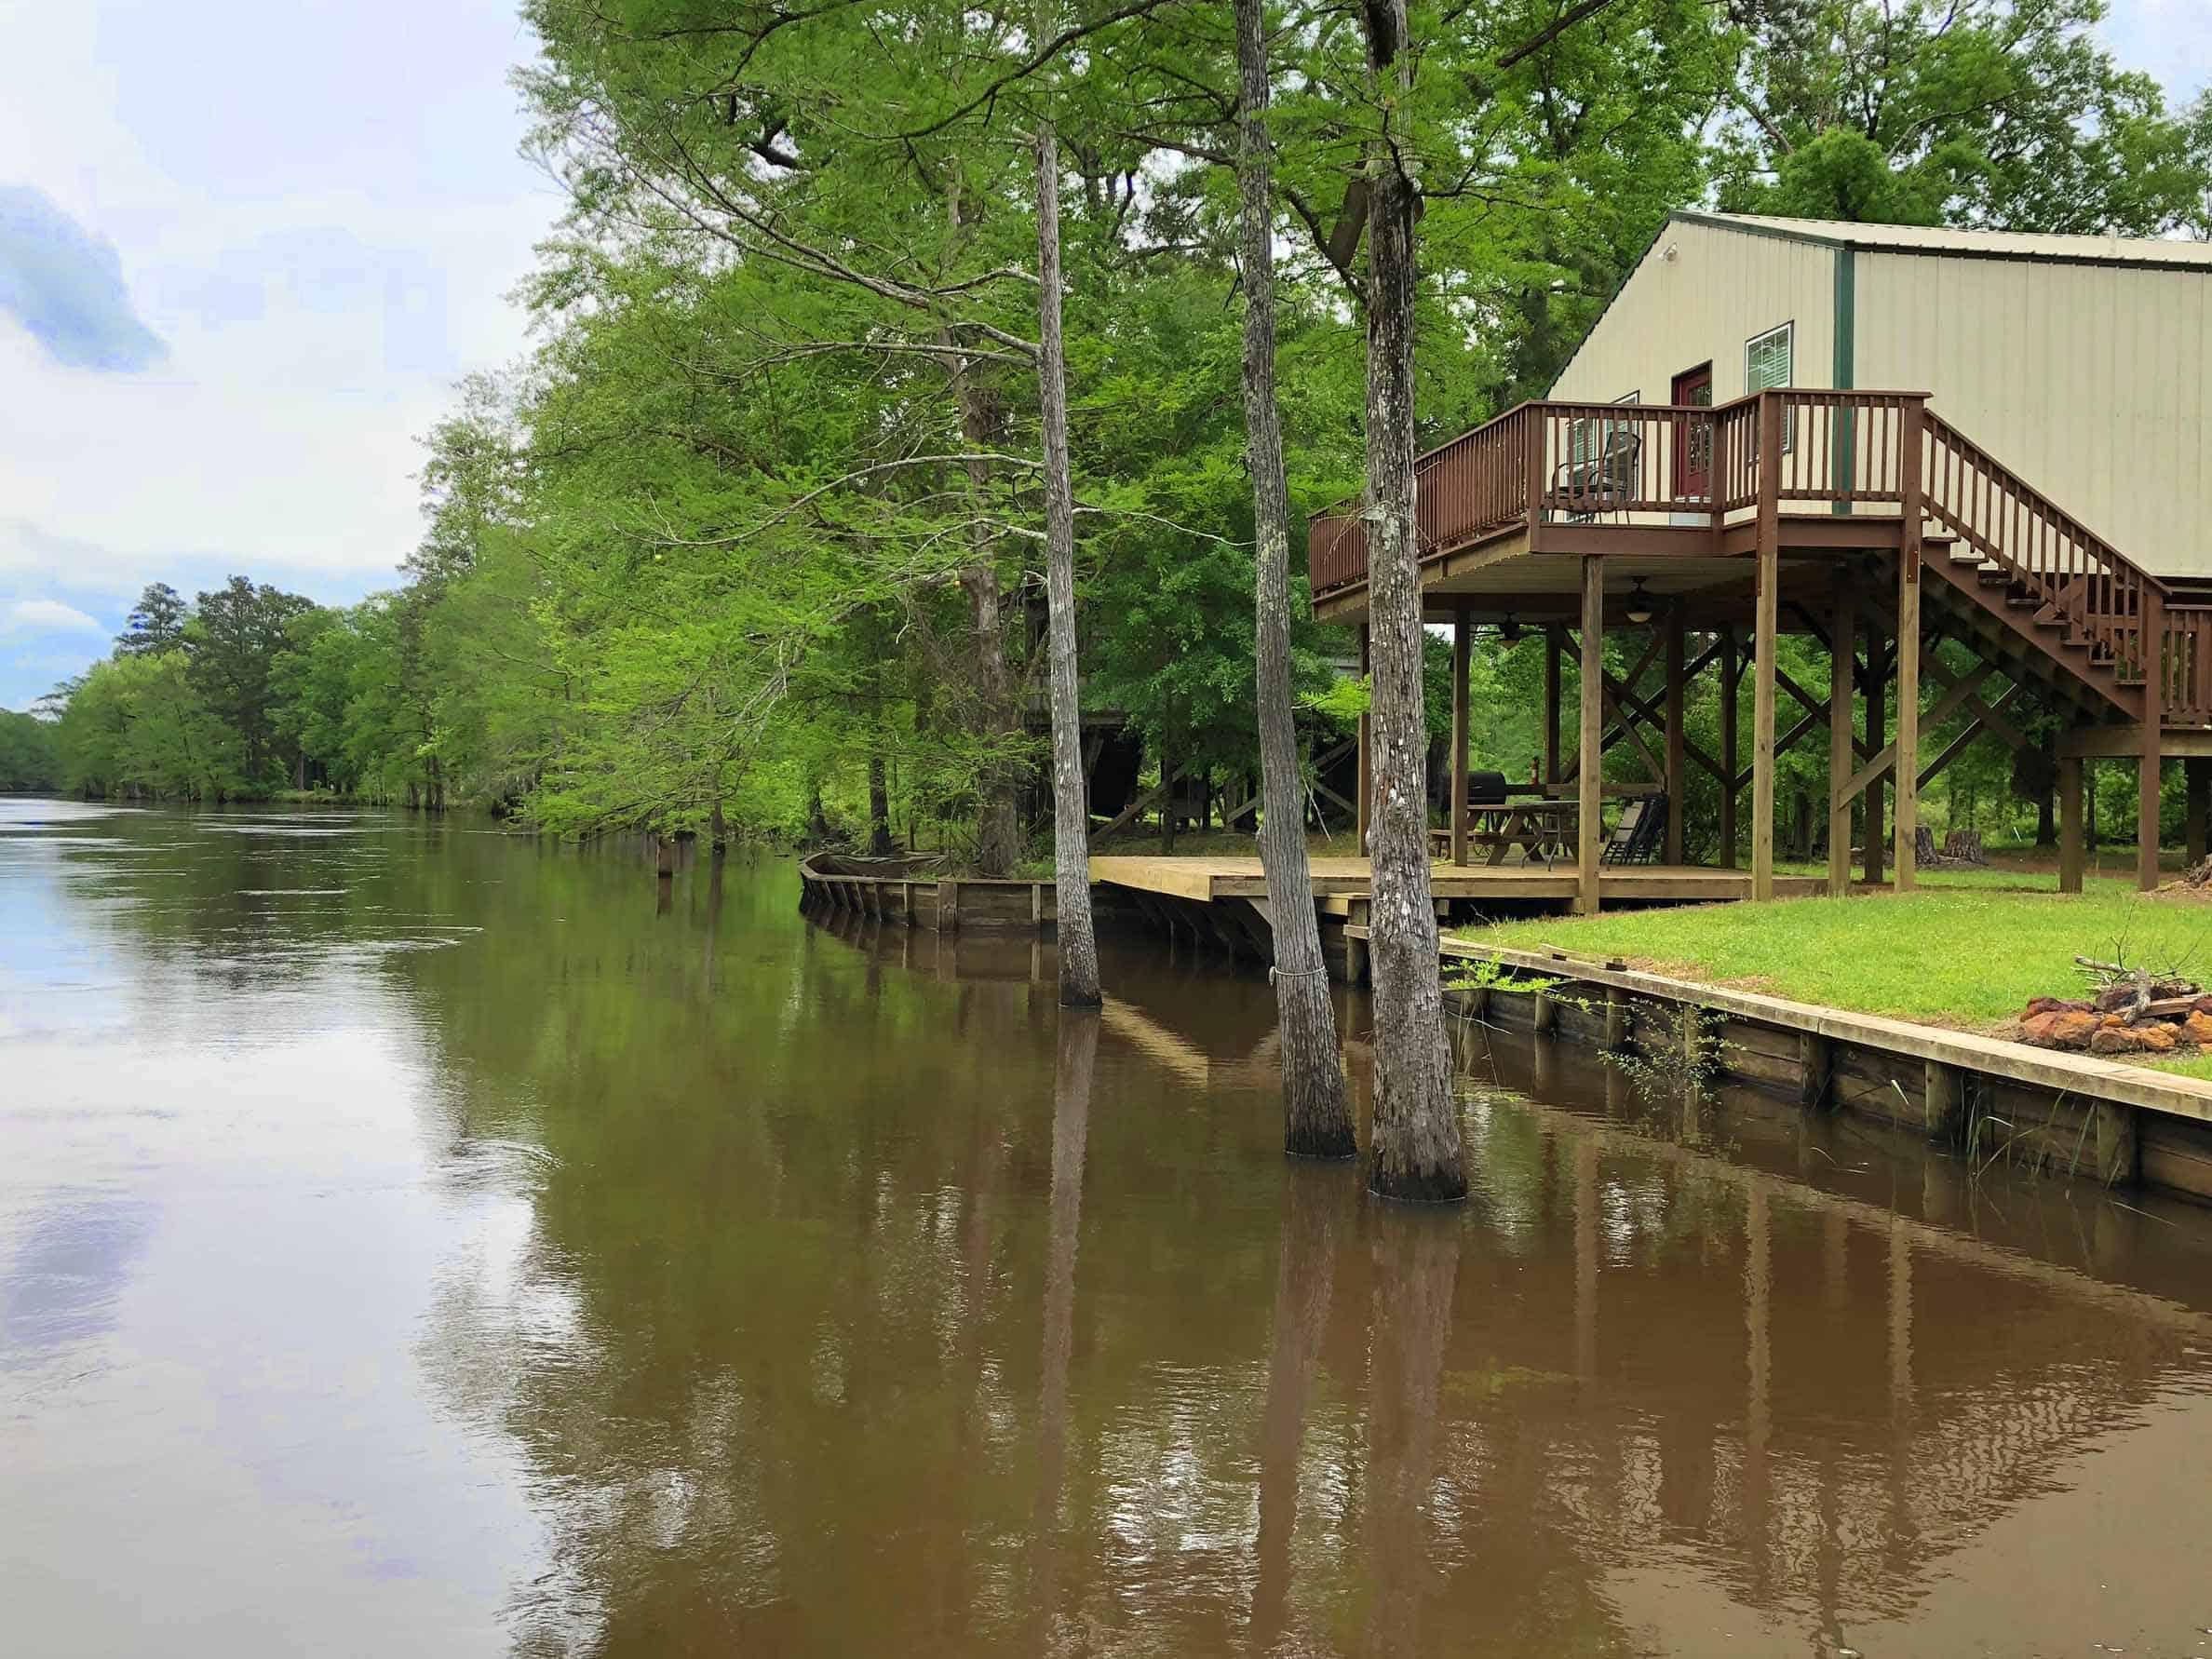 BackWater-Jacks-Cabin-Duplex-rentals-river-view